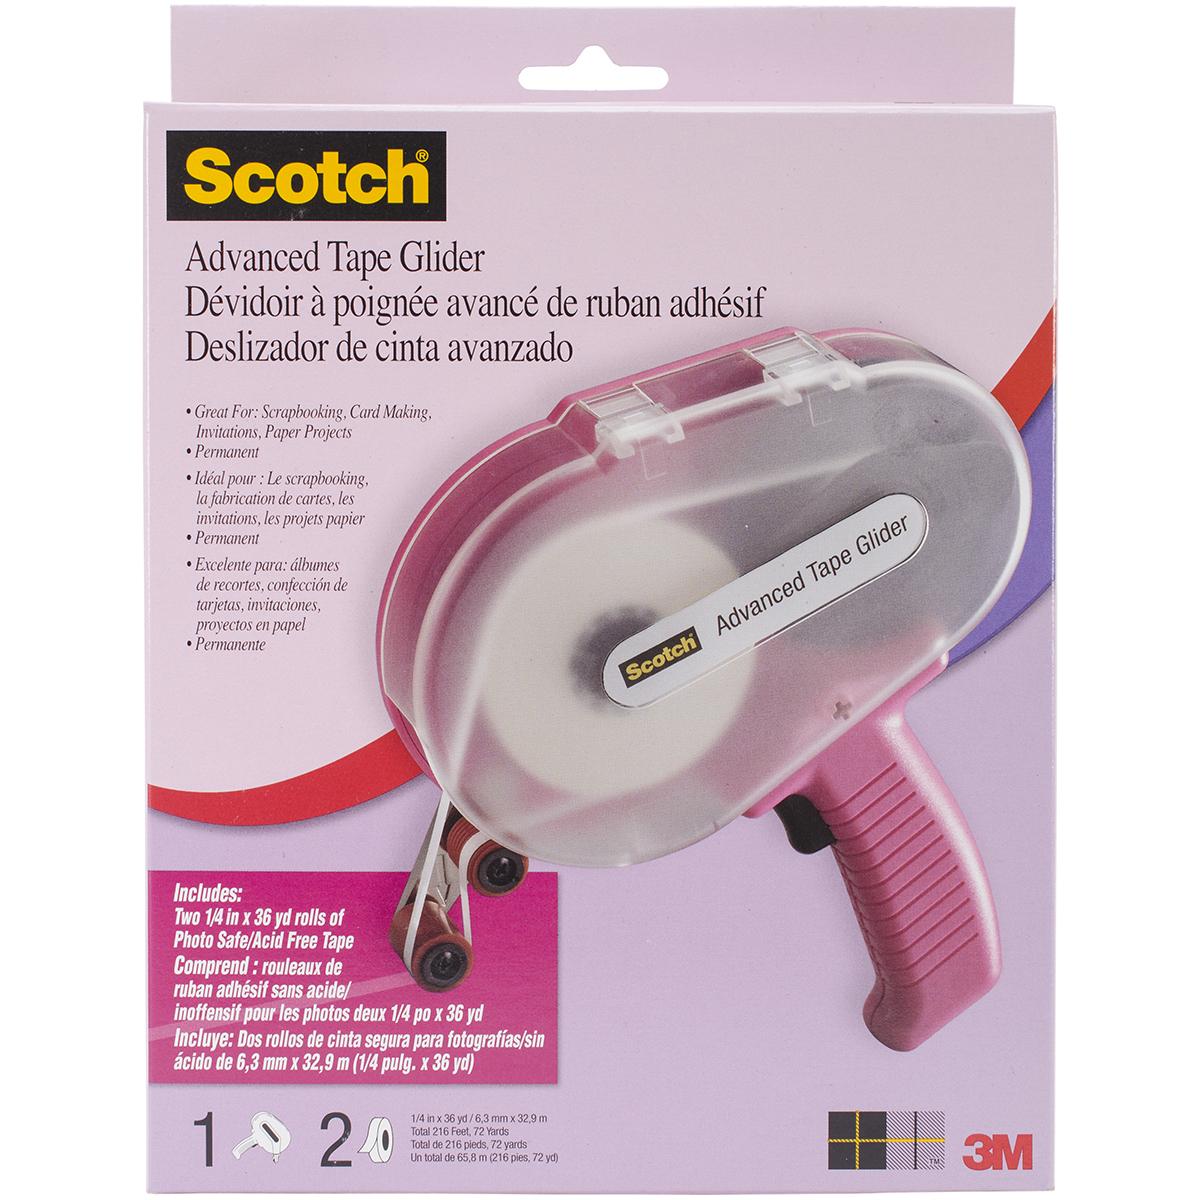 Scotch Advanced Tape Glider & Tape-Pink - .25X36yd Each